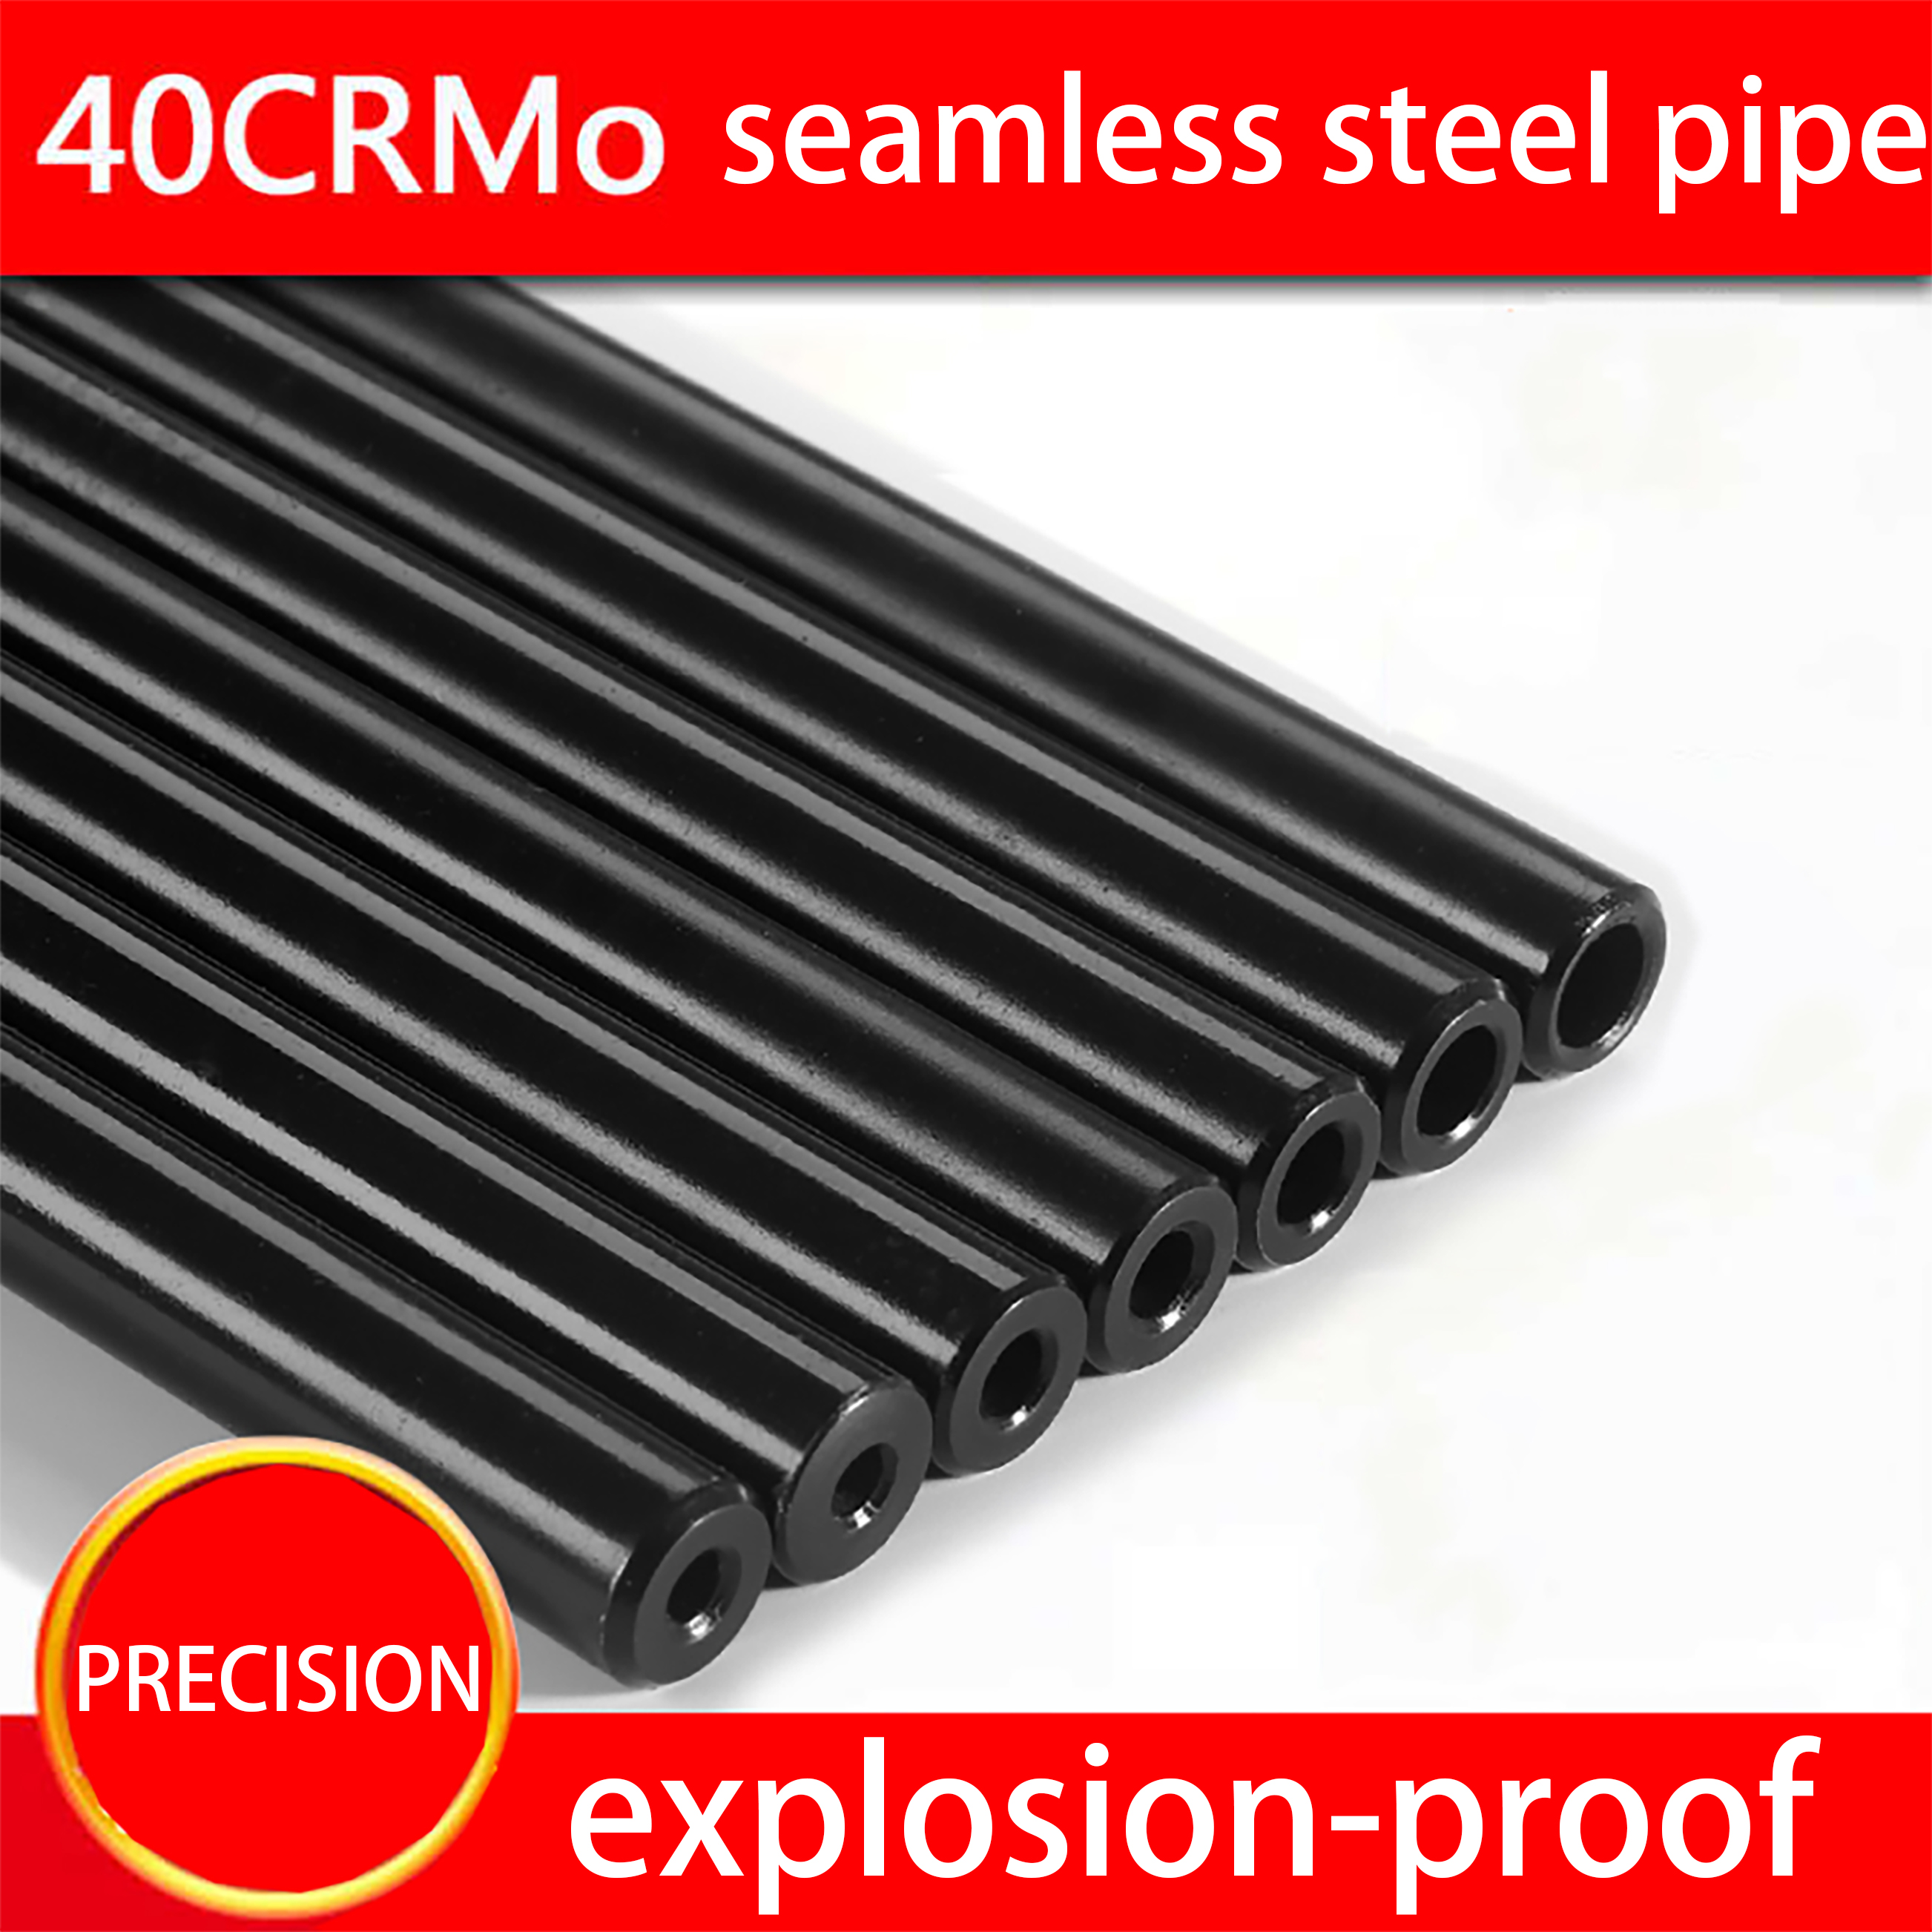 Seamless Tube OD 16 Mm Tube Steel Hydraulic Chromium-molybdenum Alloy Precision Chrome Tubes